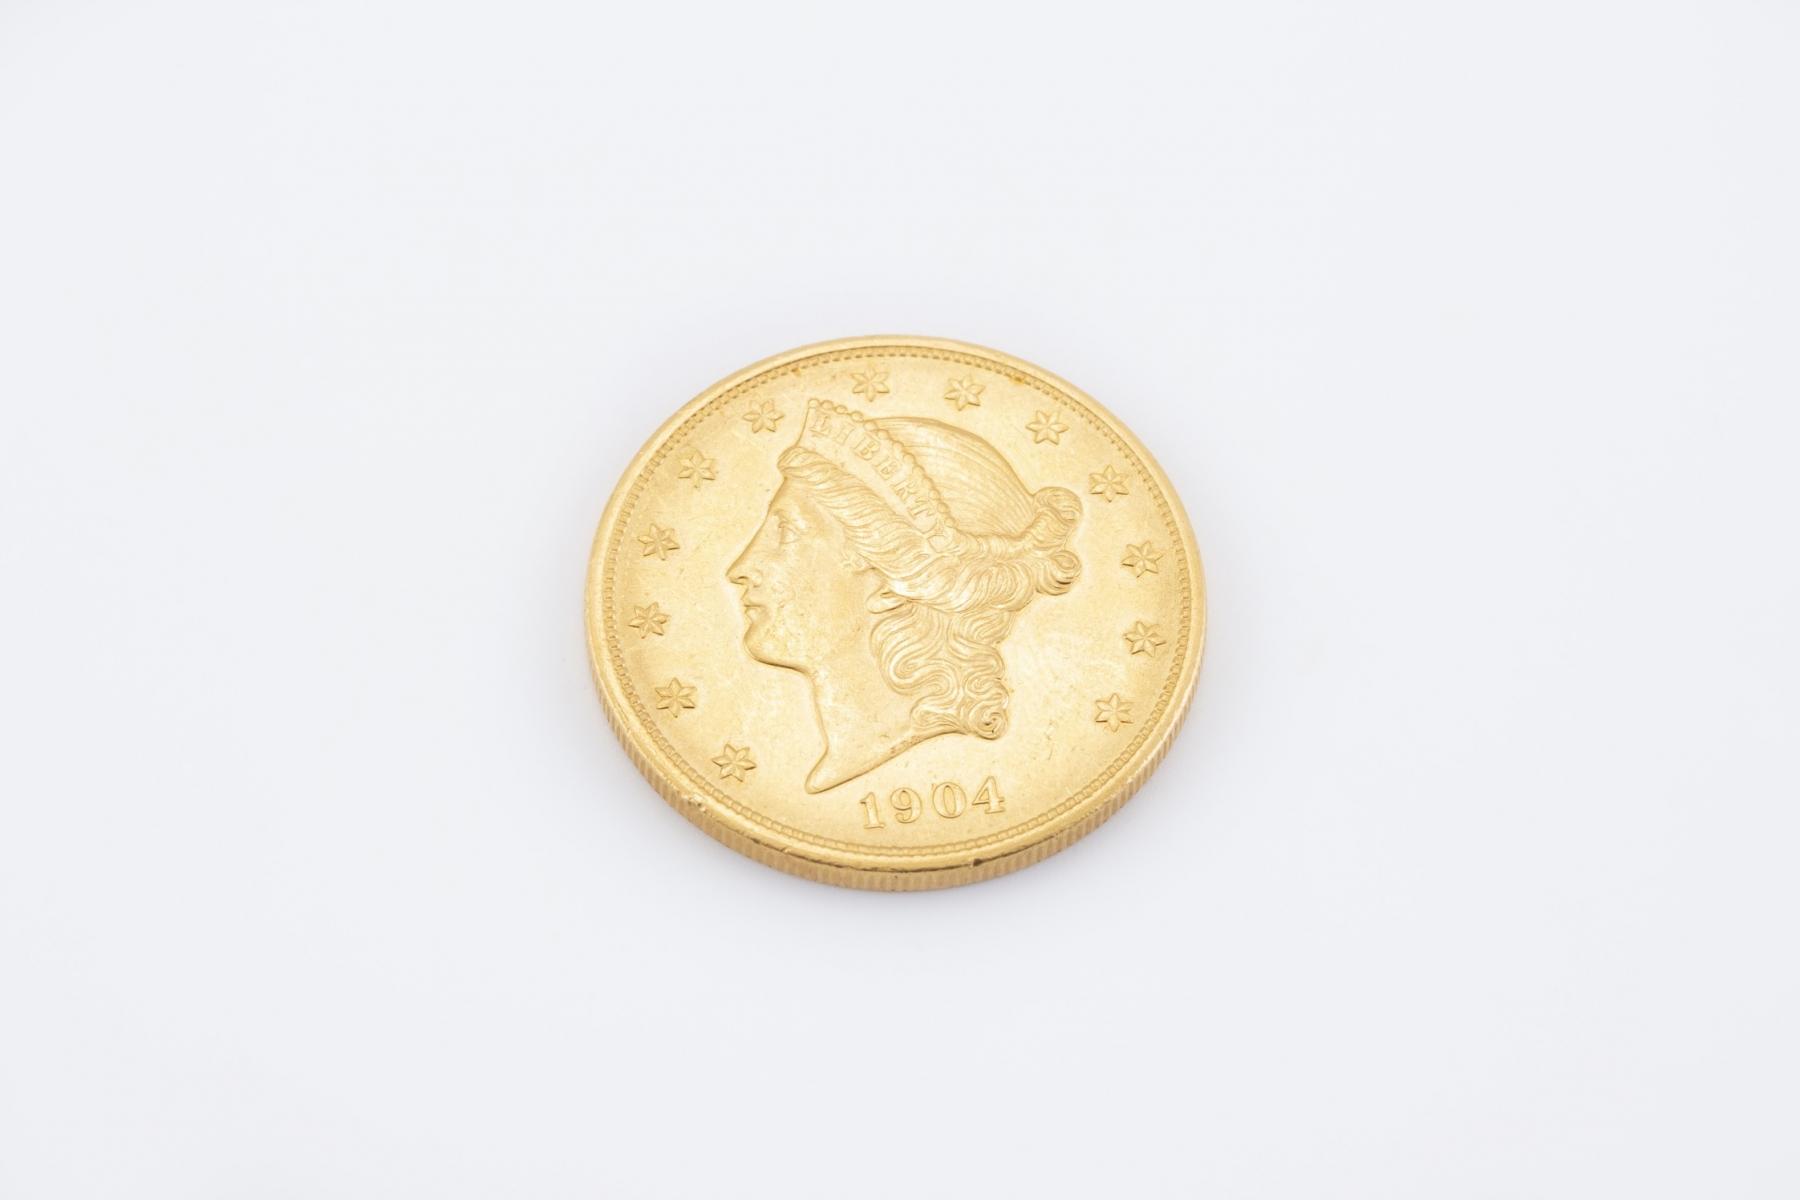 2 (2) - Pièce de 20 dollars or datée 1904. Adjugé 1416€